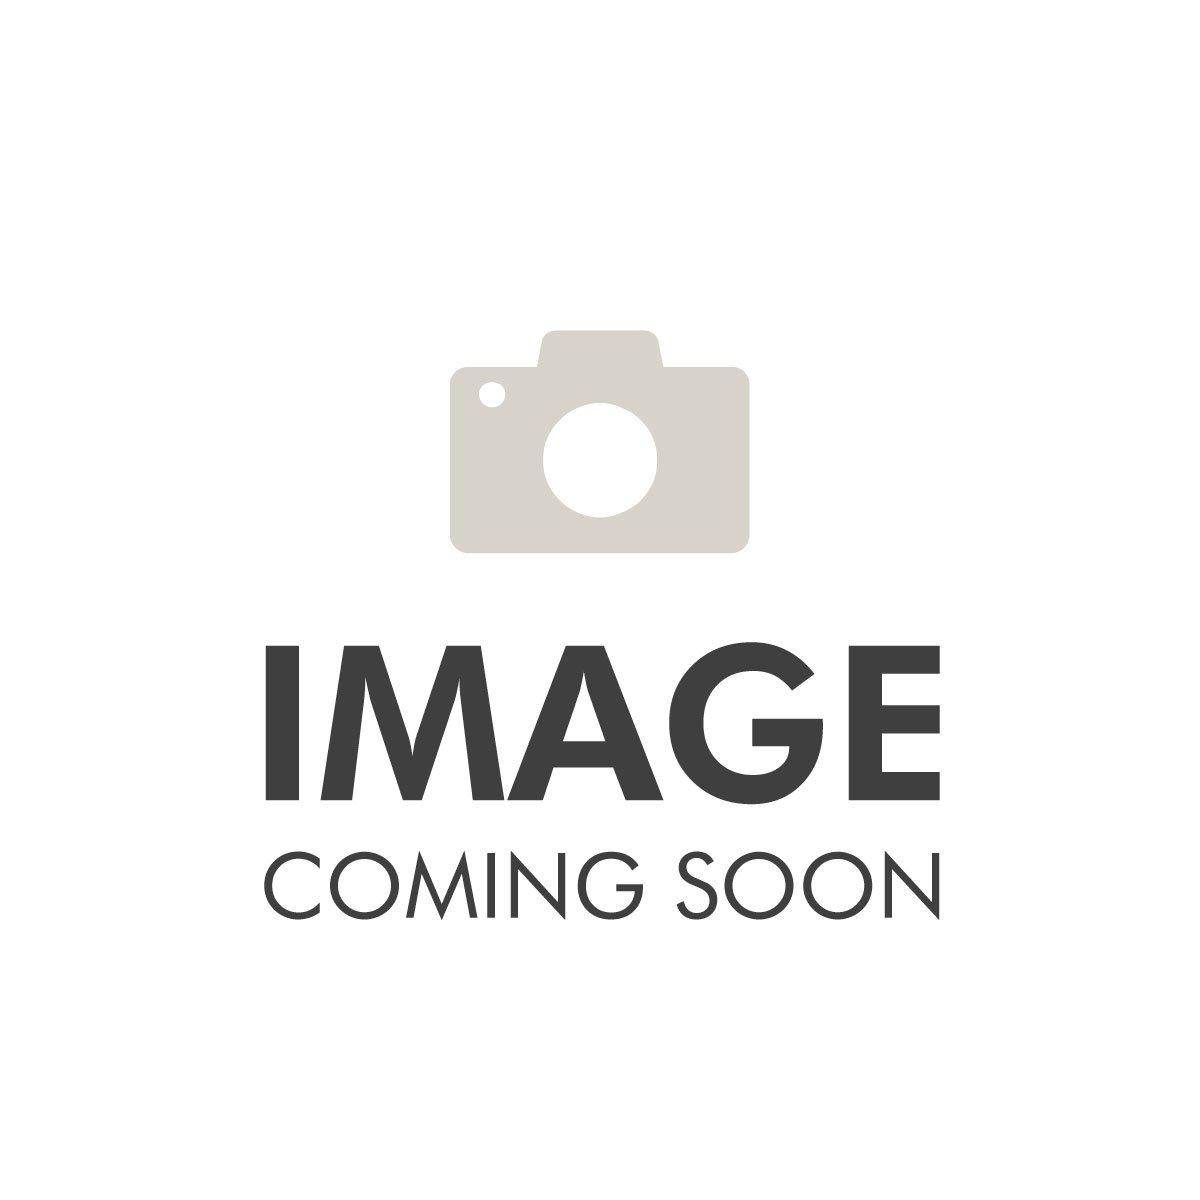 Clarins Bb Skin Perfecting Cream SPF25 03 Dark 45ml